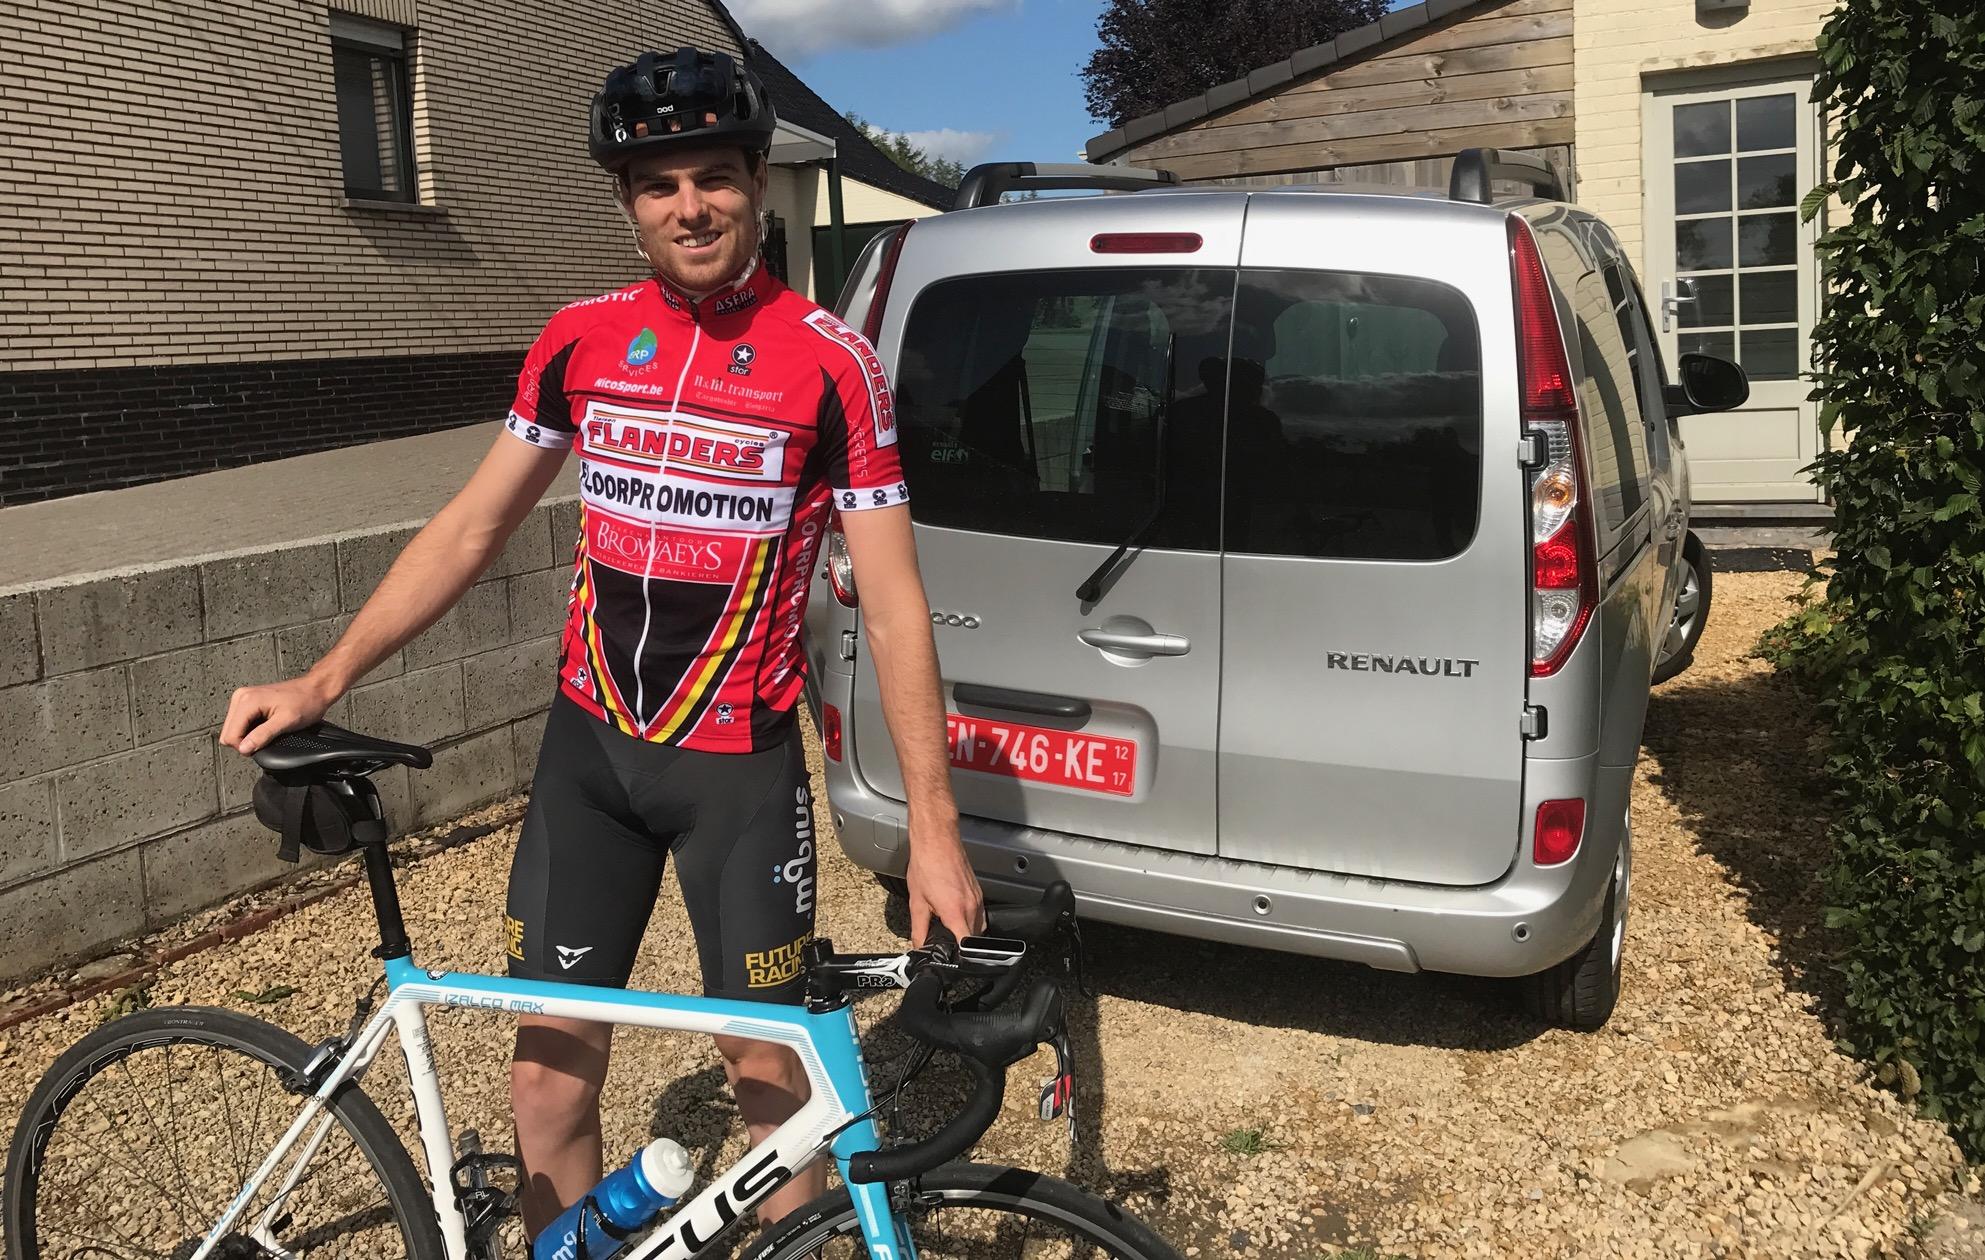 Peter Livingstone at the Kokerelle B & B at Maarke Kerkem near the Eikenberg climb